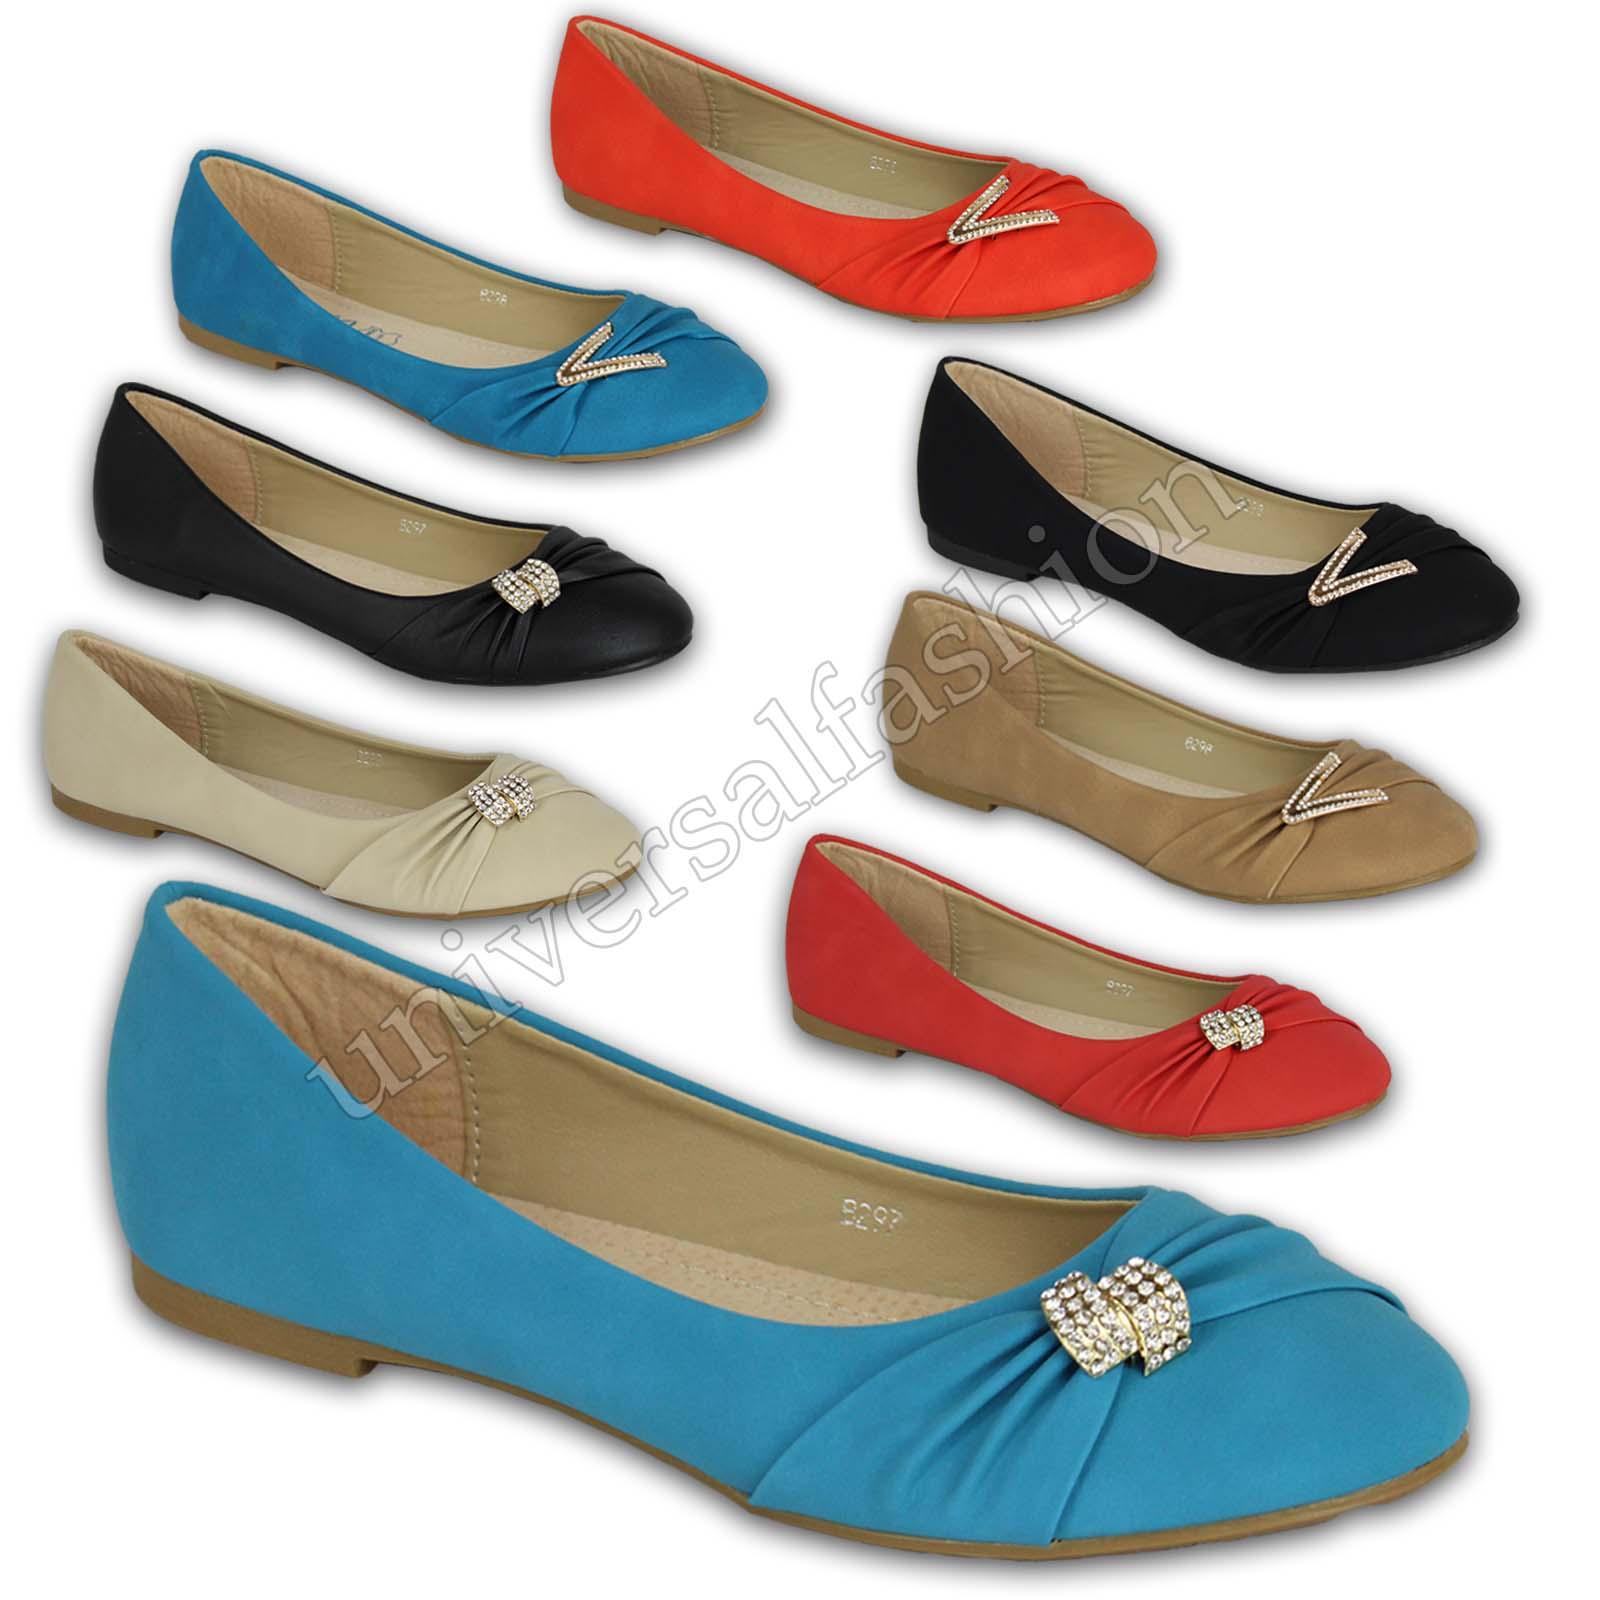 chaussures femme plates. Black Bedroom Furniture Sets. Home Design Ideas